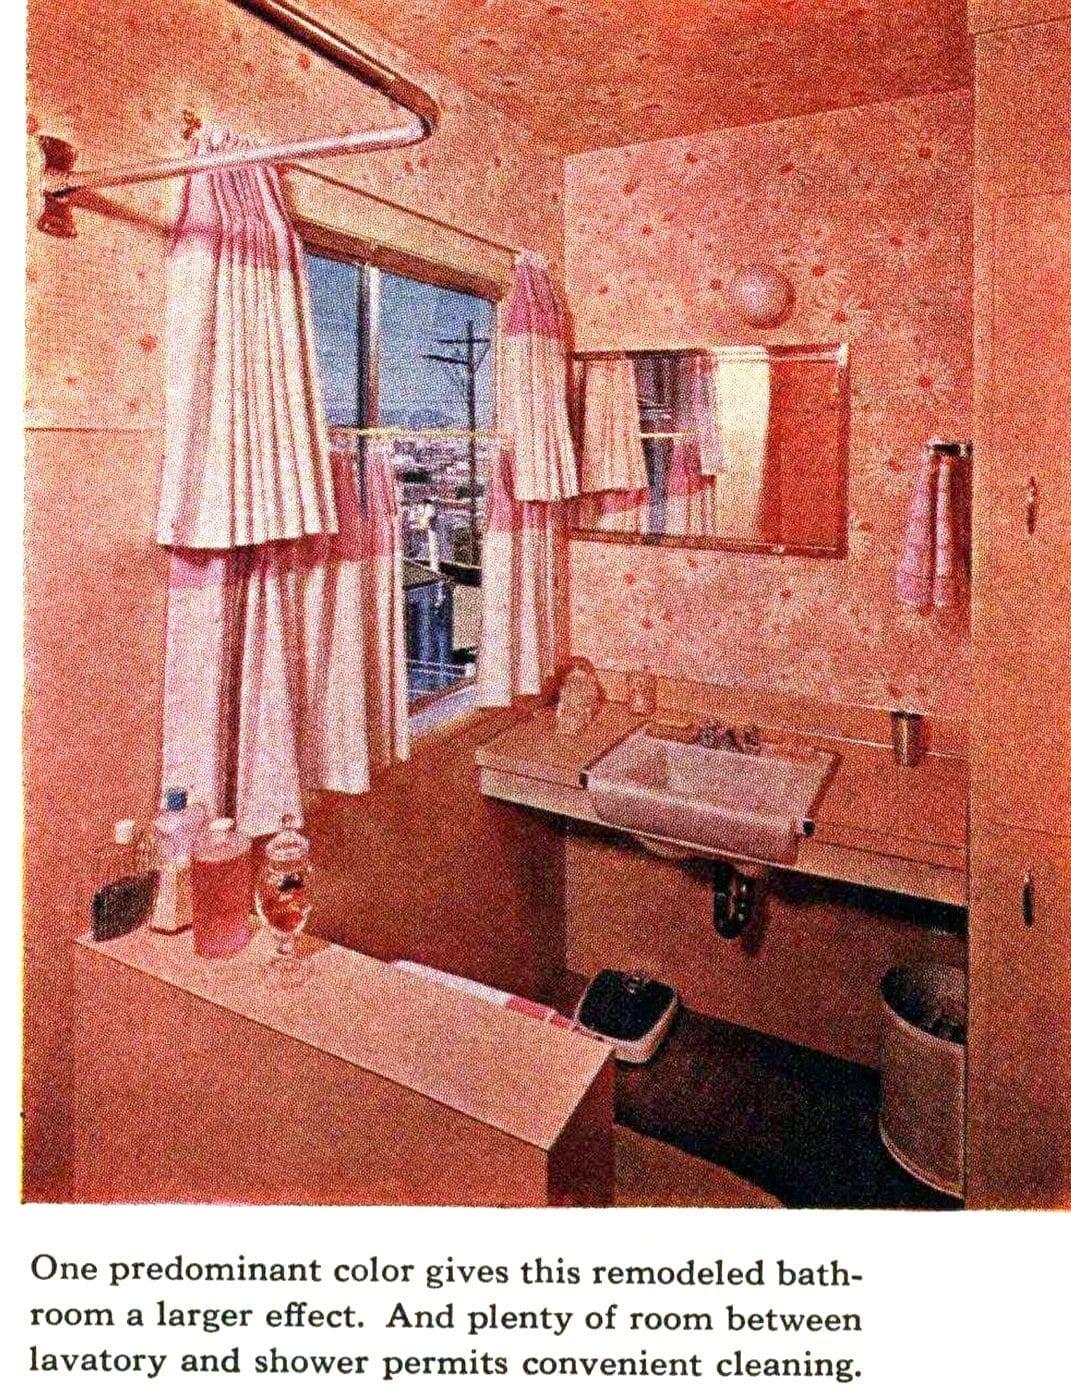 Vintage 60s bathroom decor ideas (3)